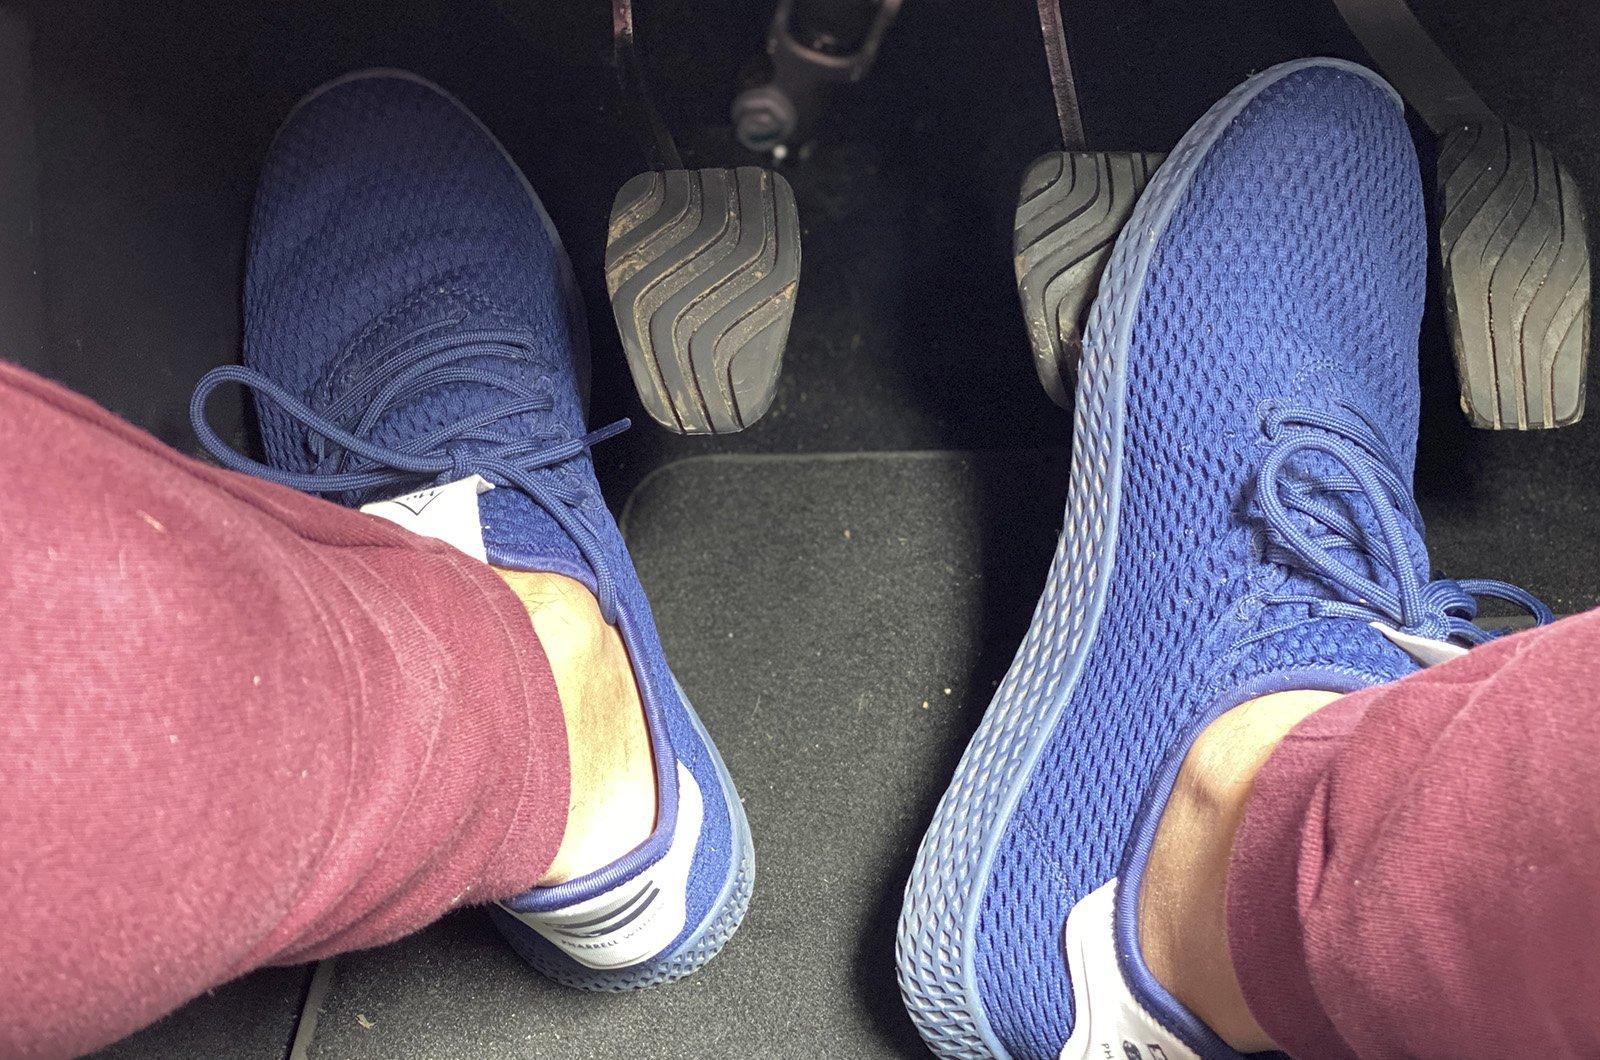 Nissan Juke pedals